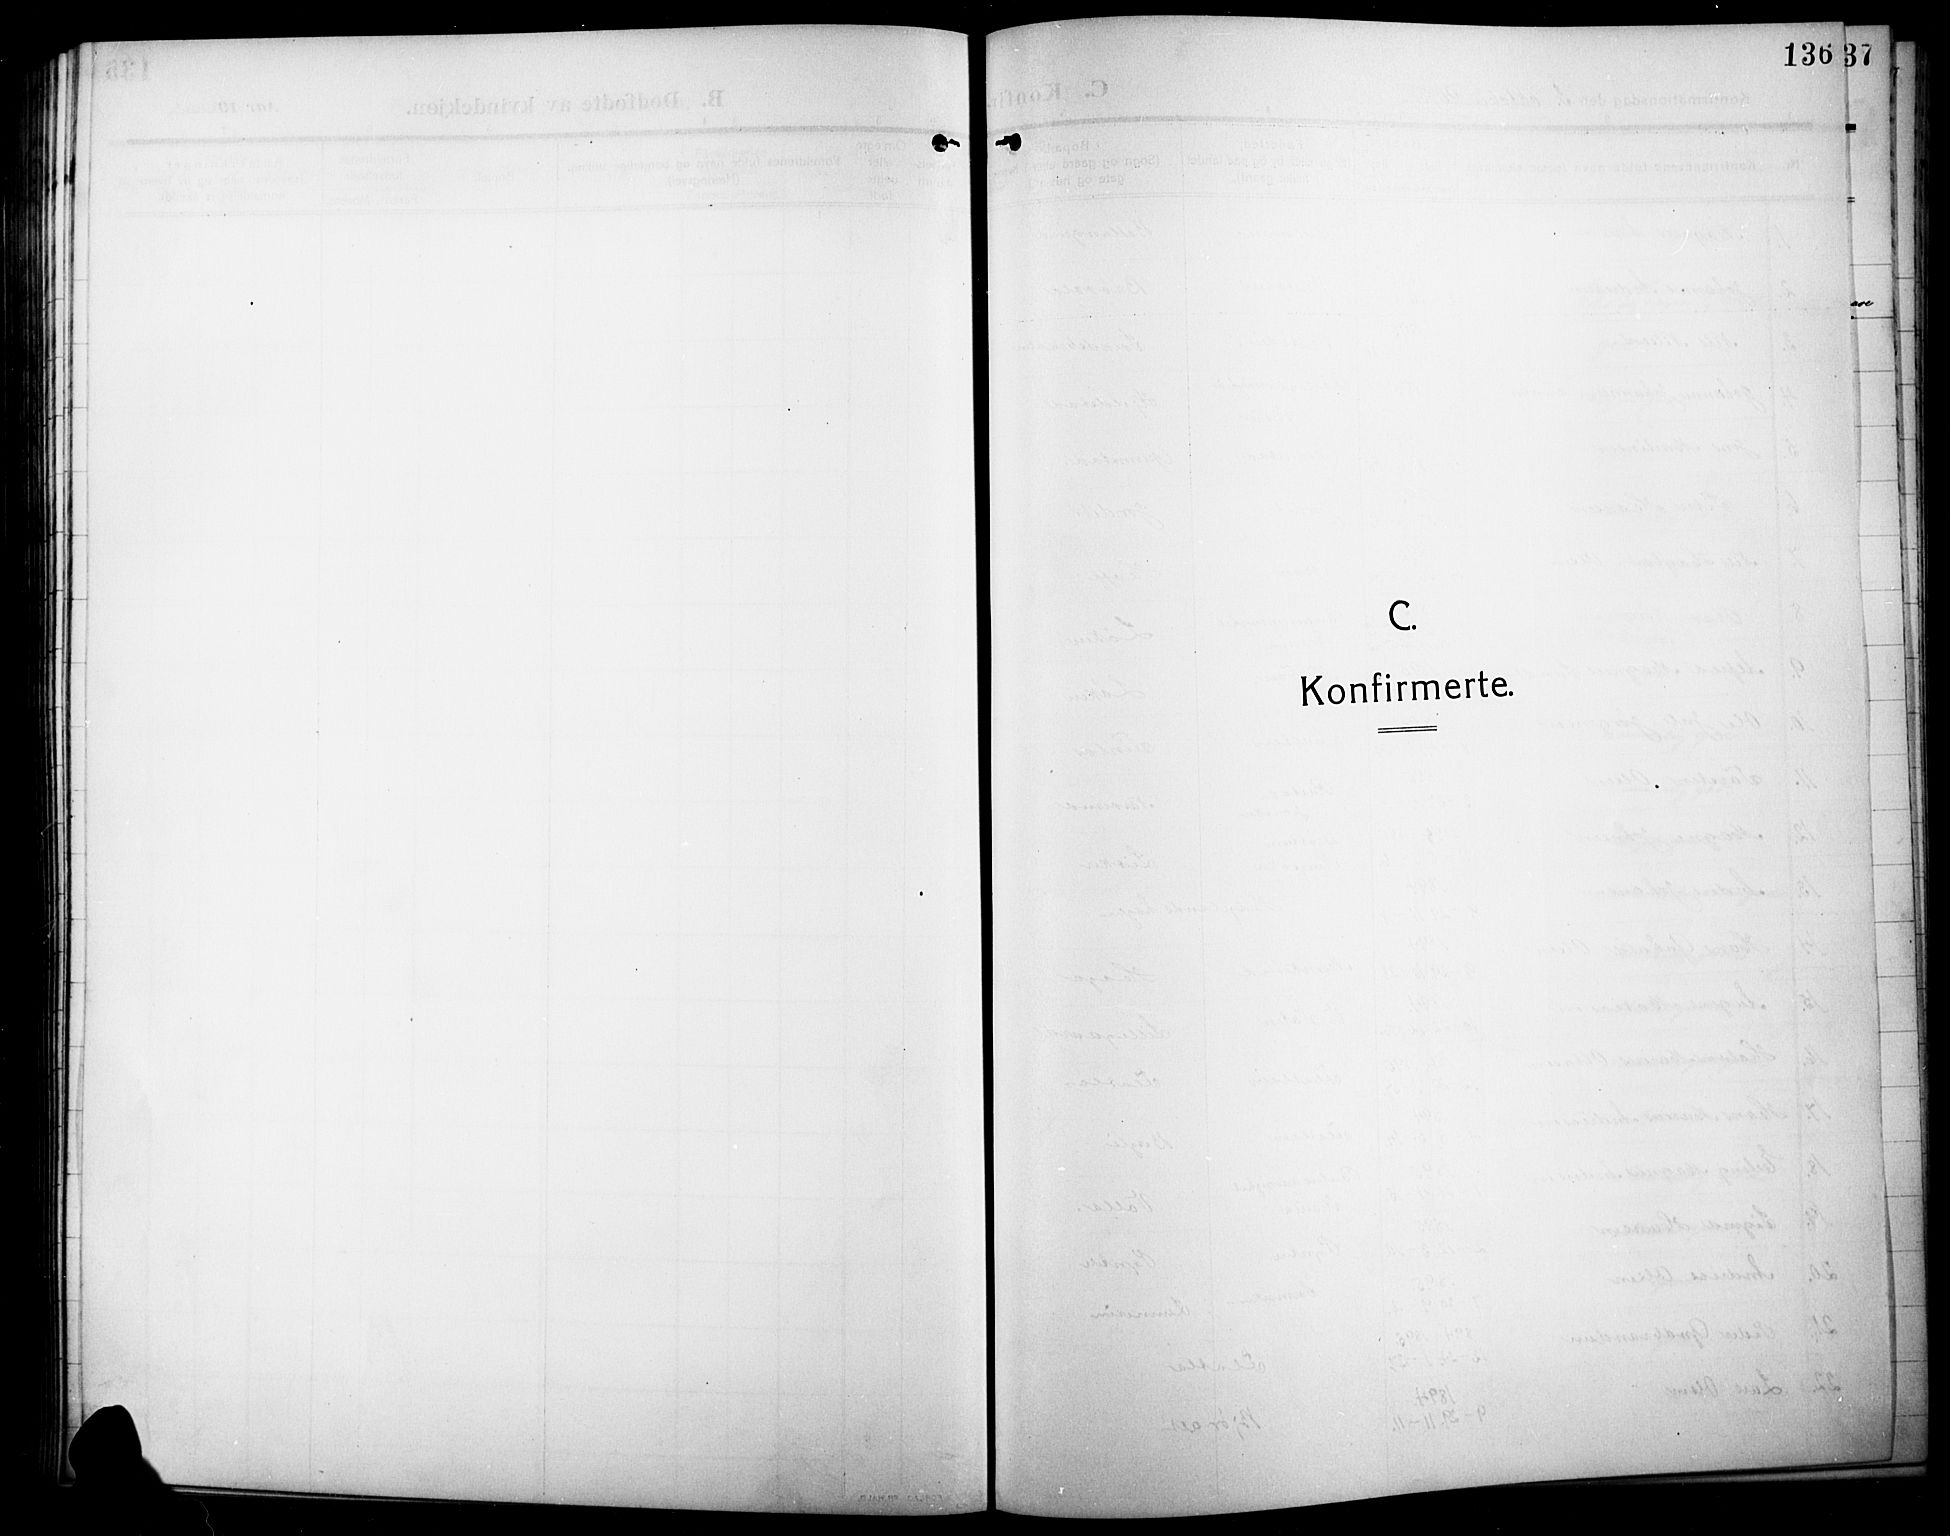 SAH, Lunner prestekontor, H/Ha/Hab/L0001: Klokkerbok nr. 1, 1909-1922, s. 136